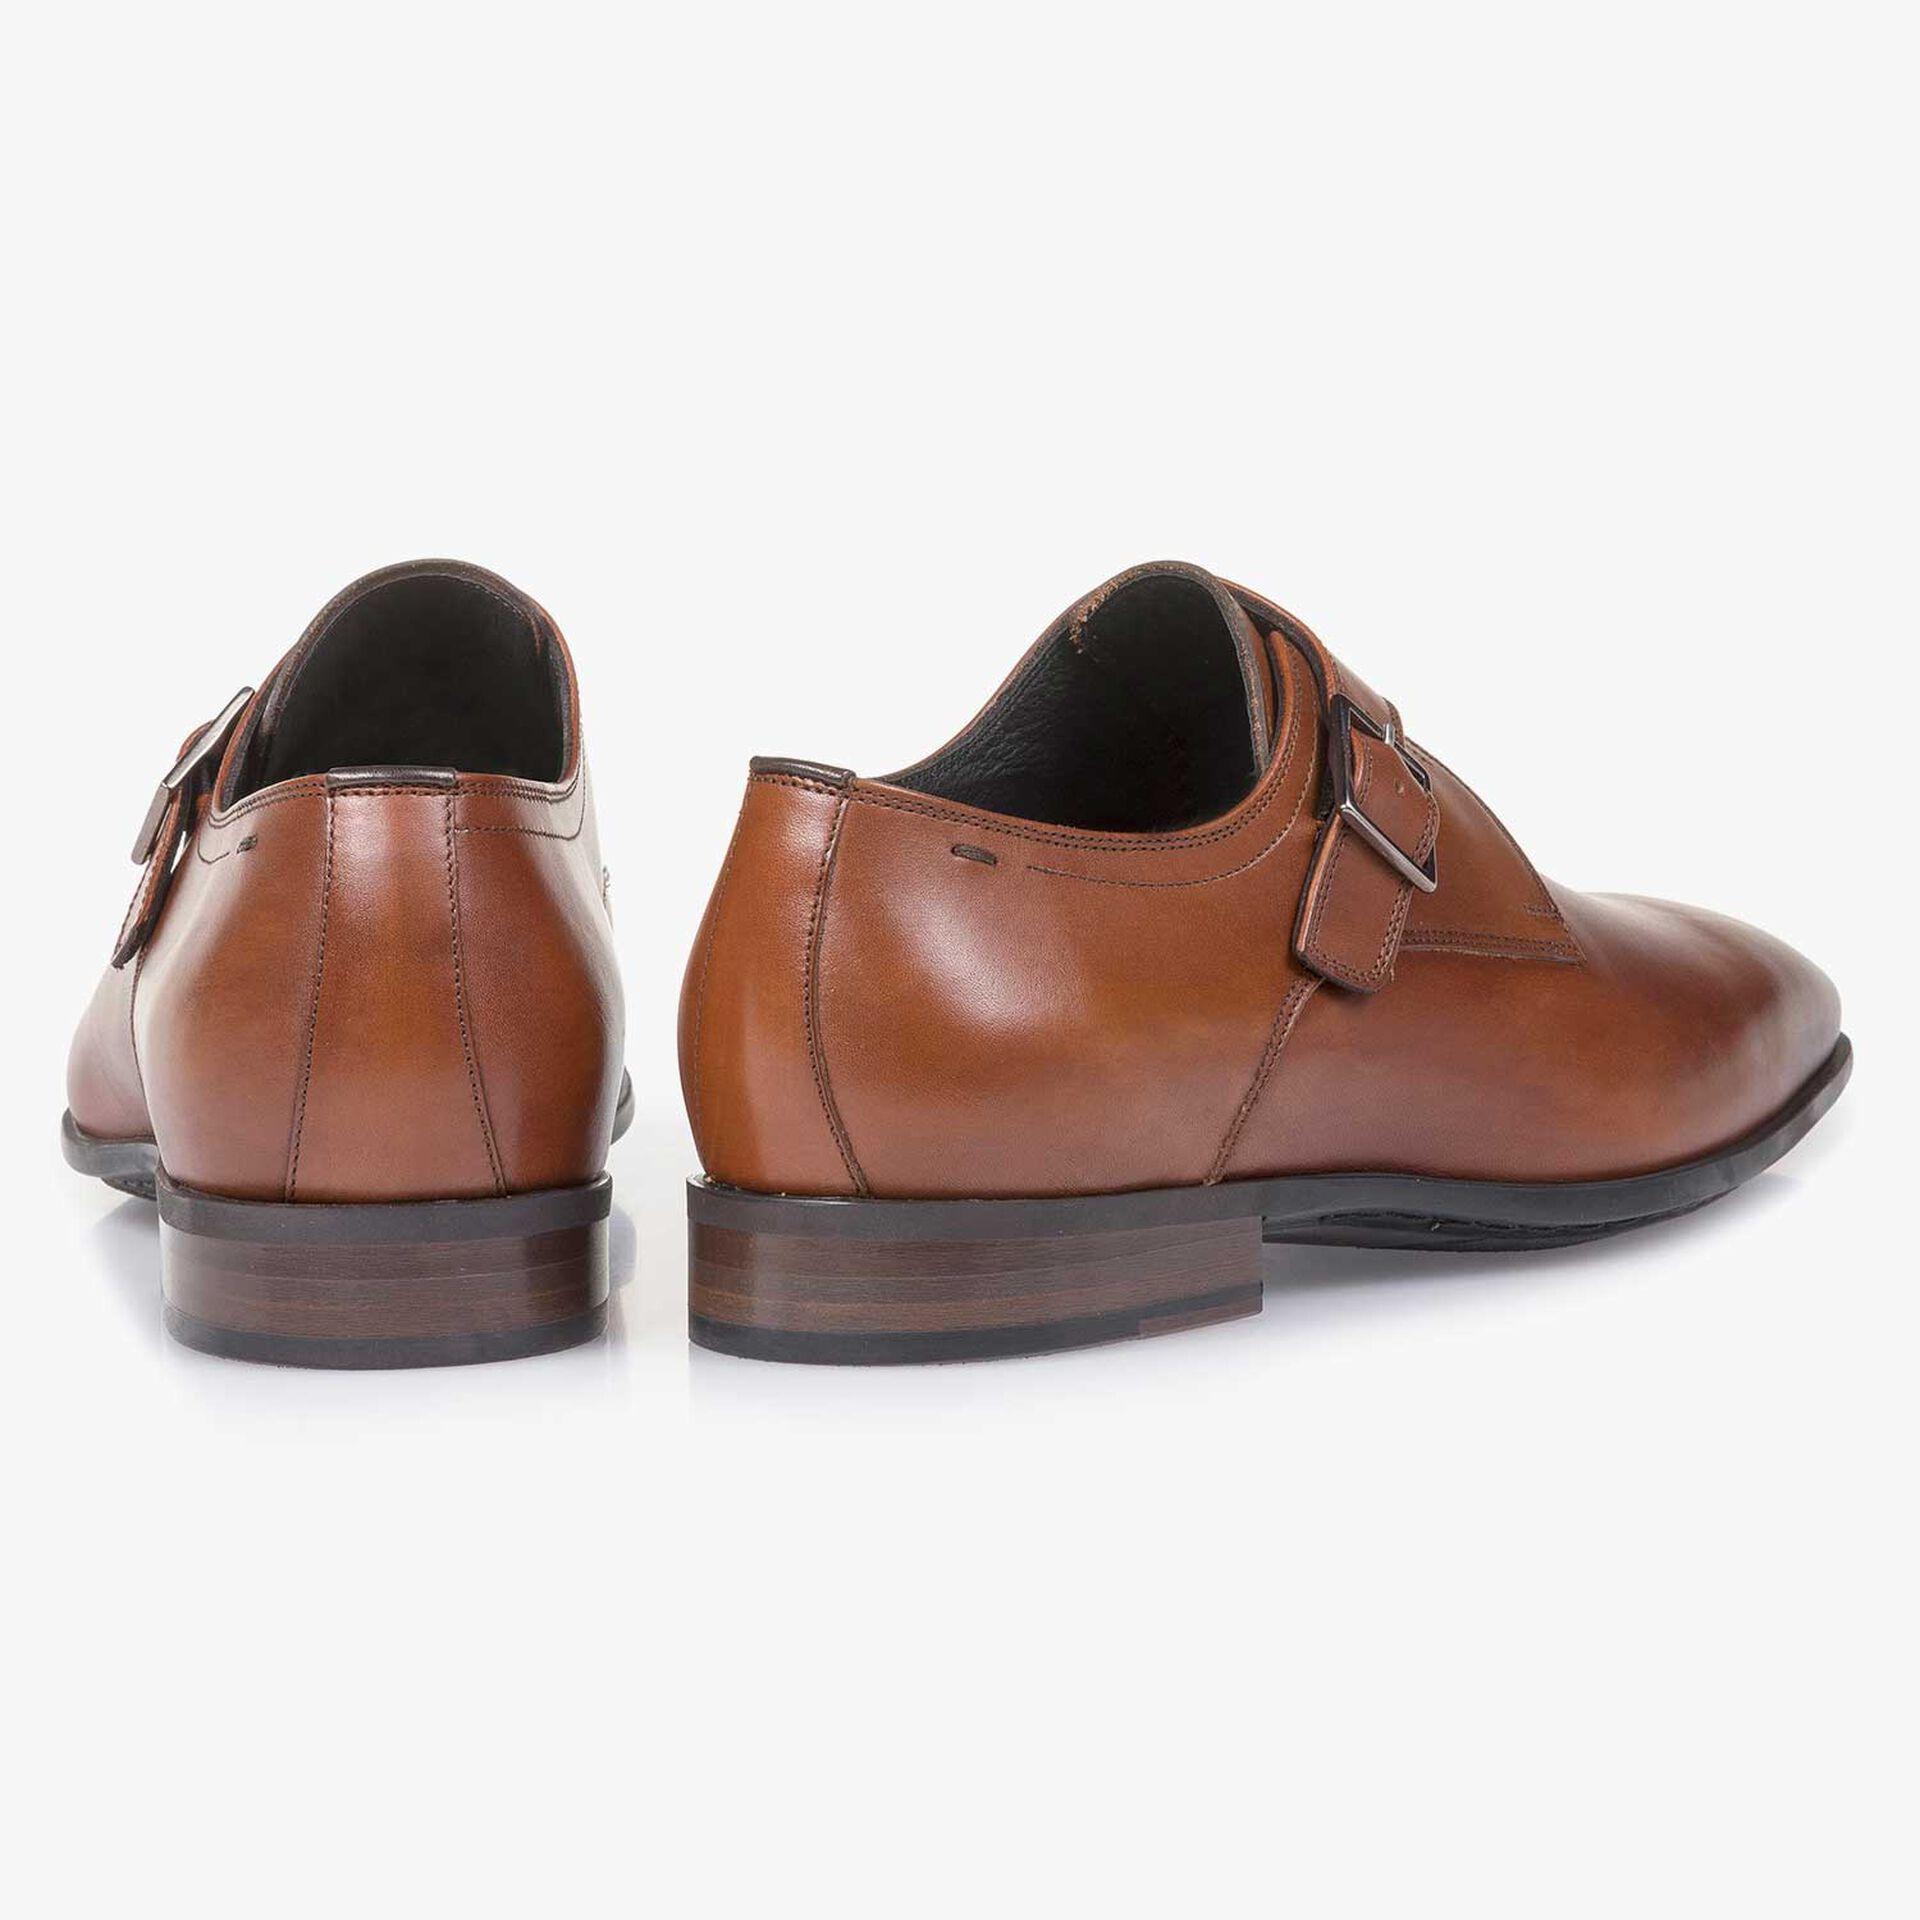 Cognac-coloured calf leather monk strap